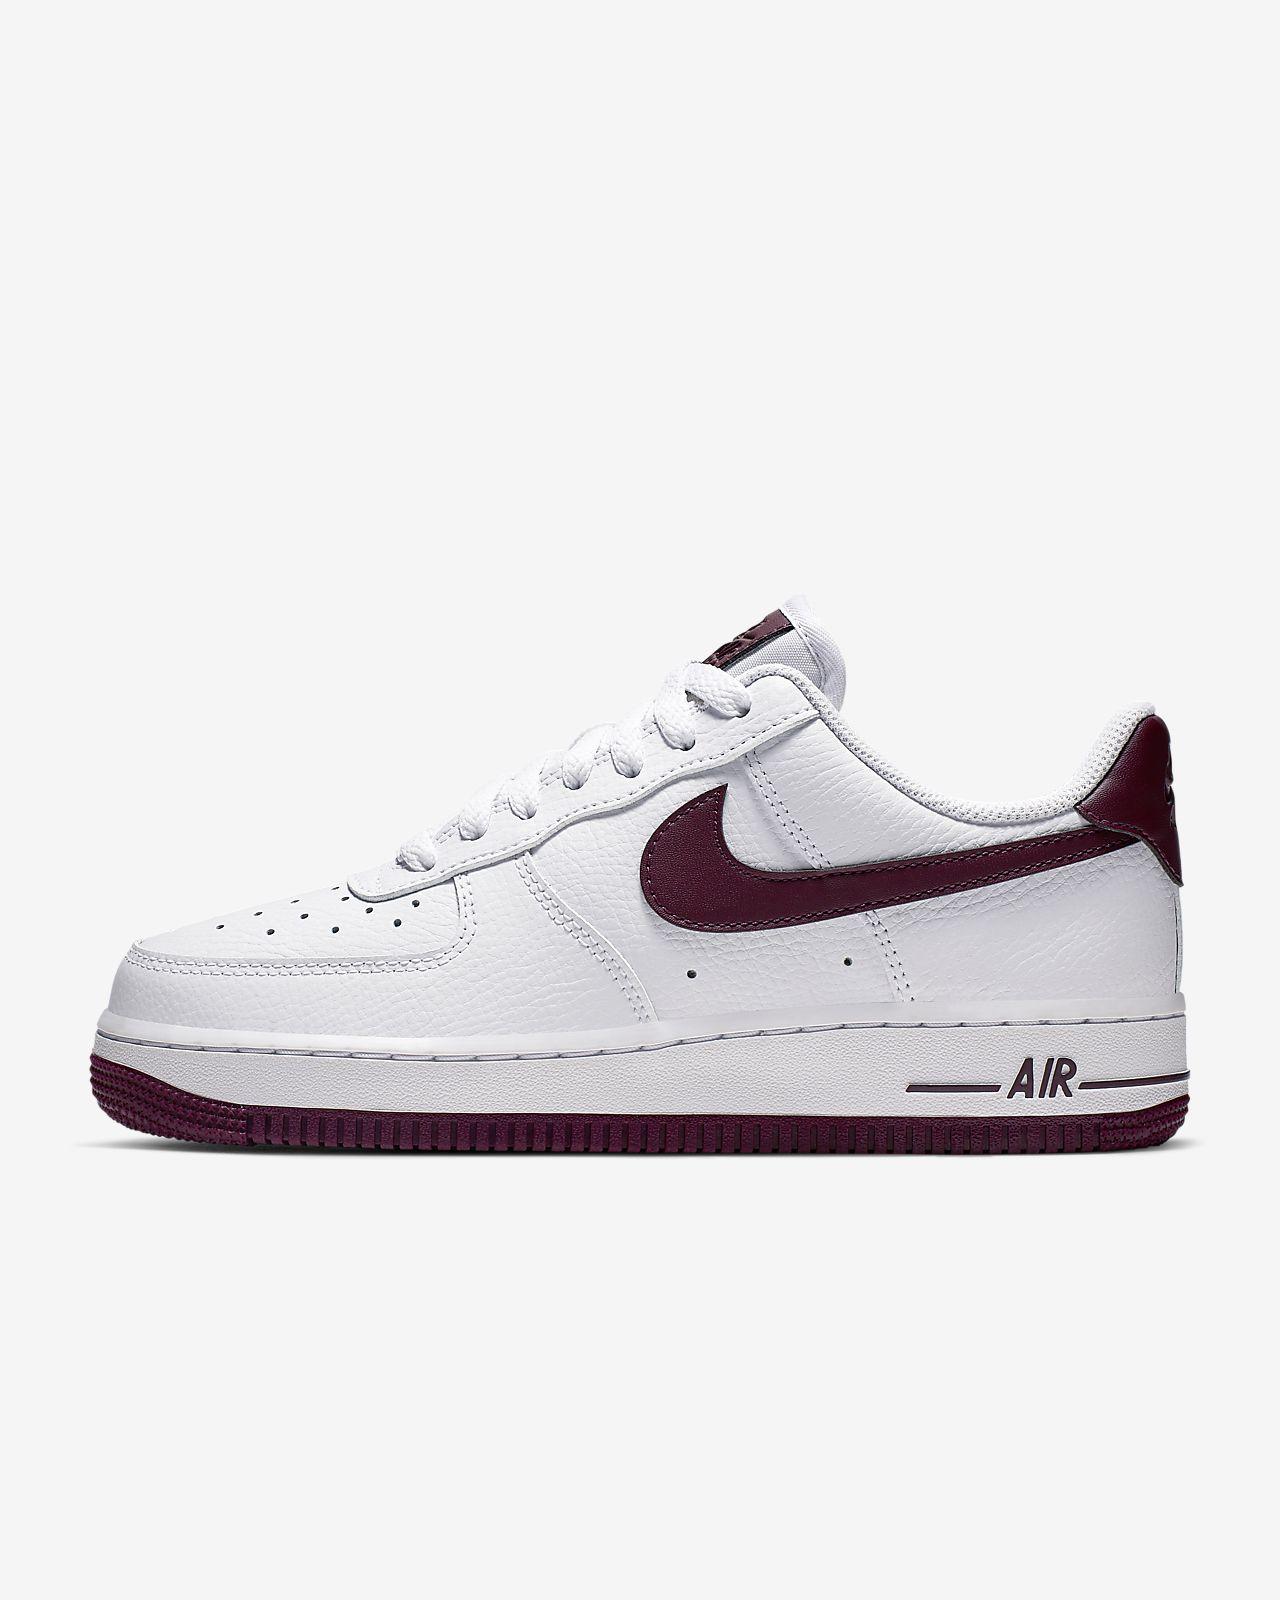 finest selection 46c1a d1668 Women s Shoe. Nike Air Force 1  07 Patent